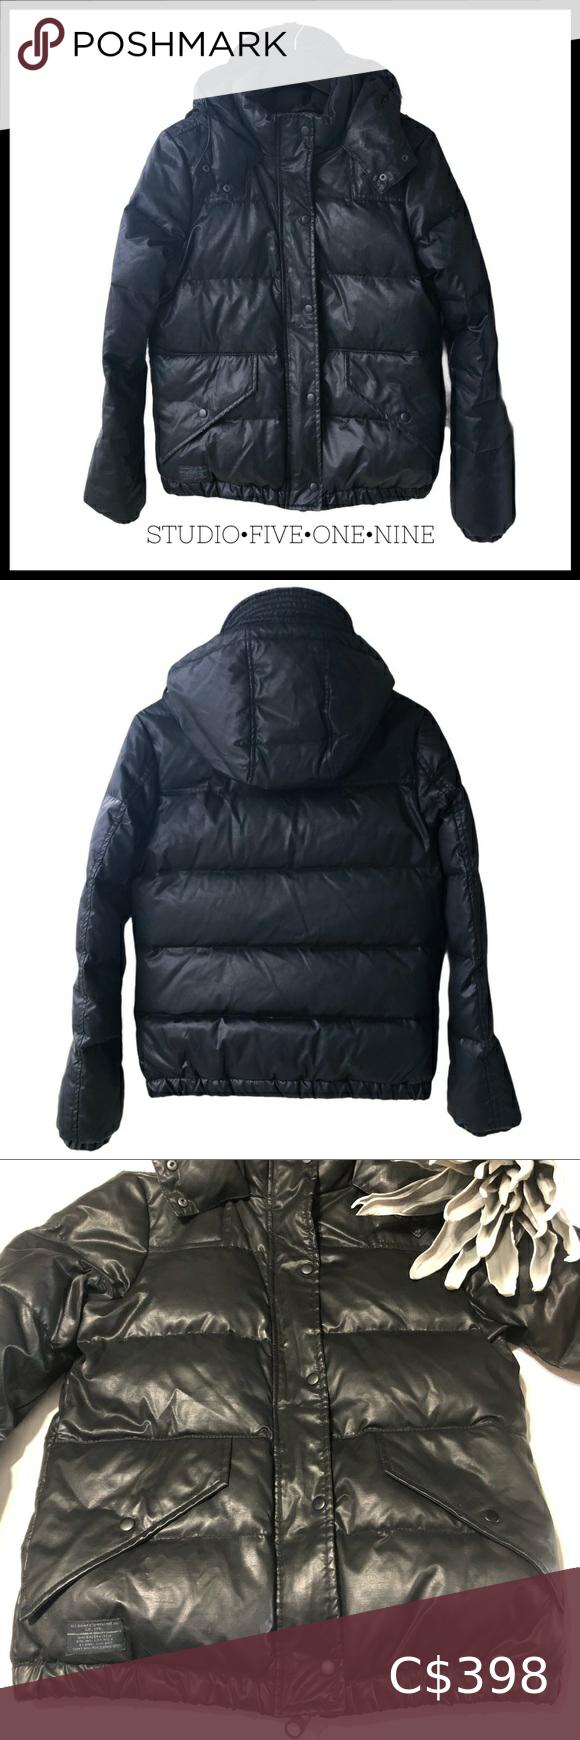 Allsaints Discrete Puffer Jacket Hooded Jacket Jackets Puffer Jackets [ 1740 x 580 Pixel ]